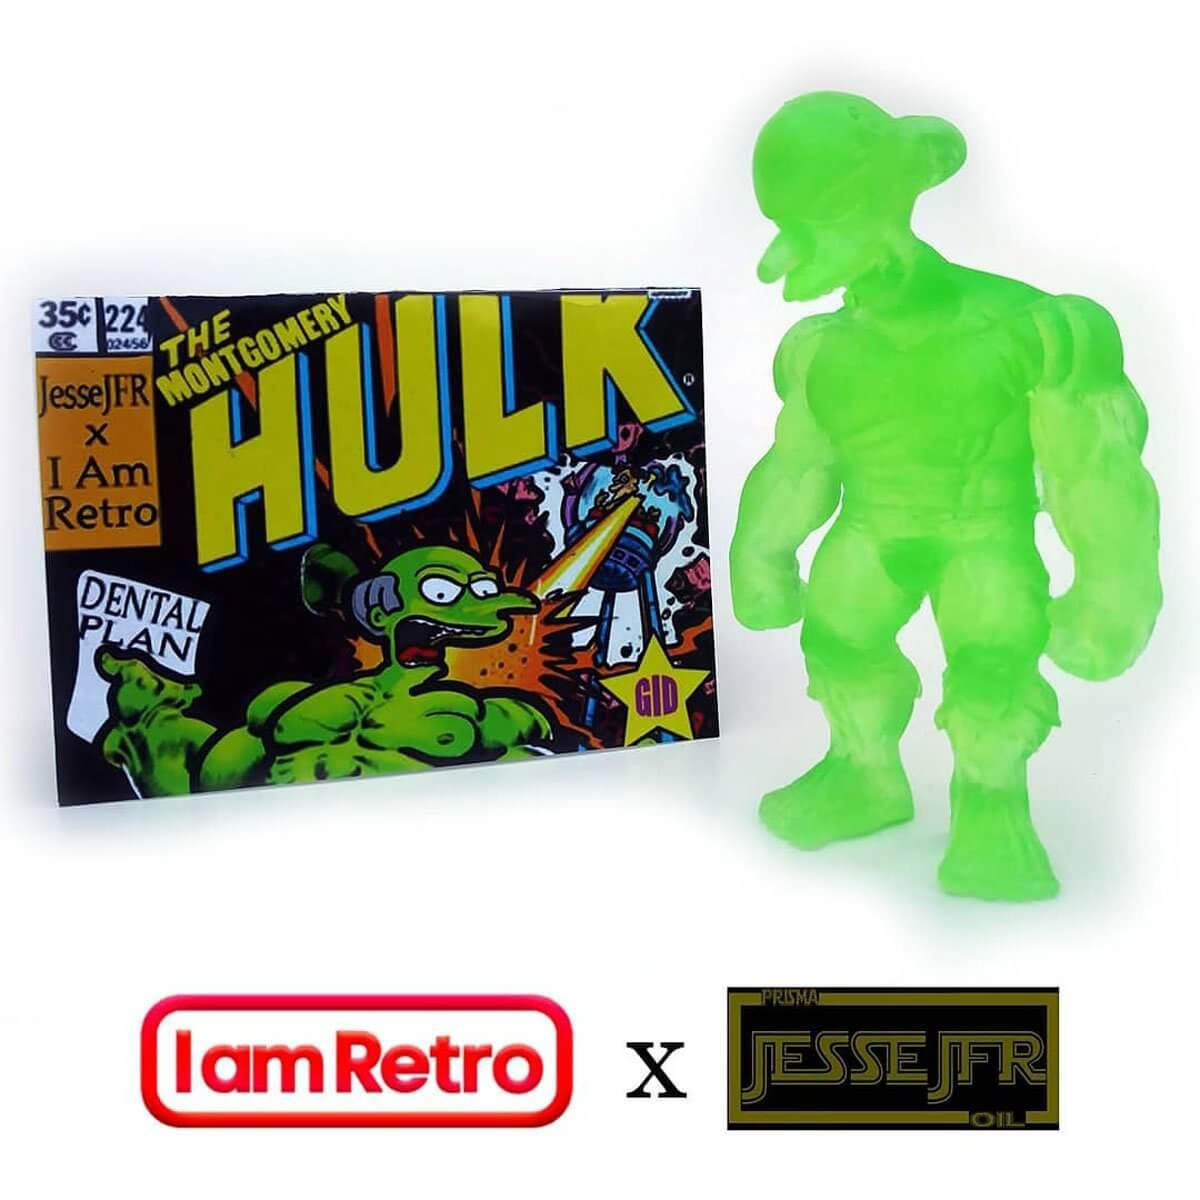 Montgomery-Hulk-JesseJFR-iamRetro